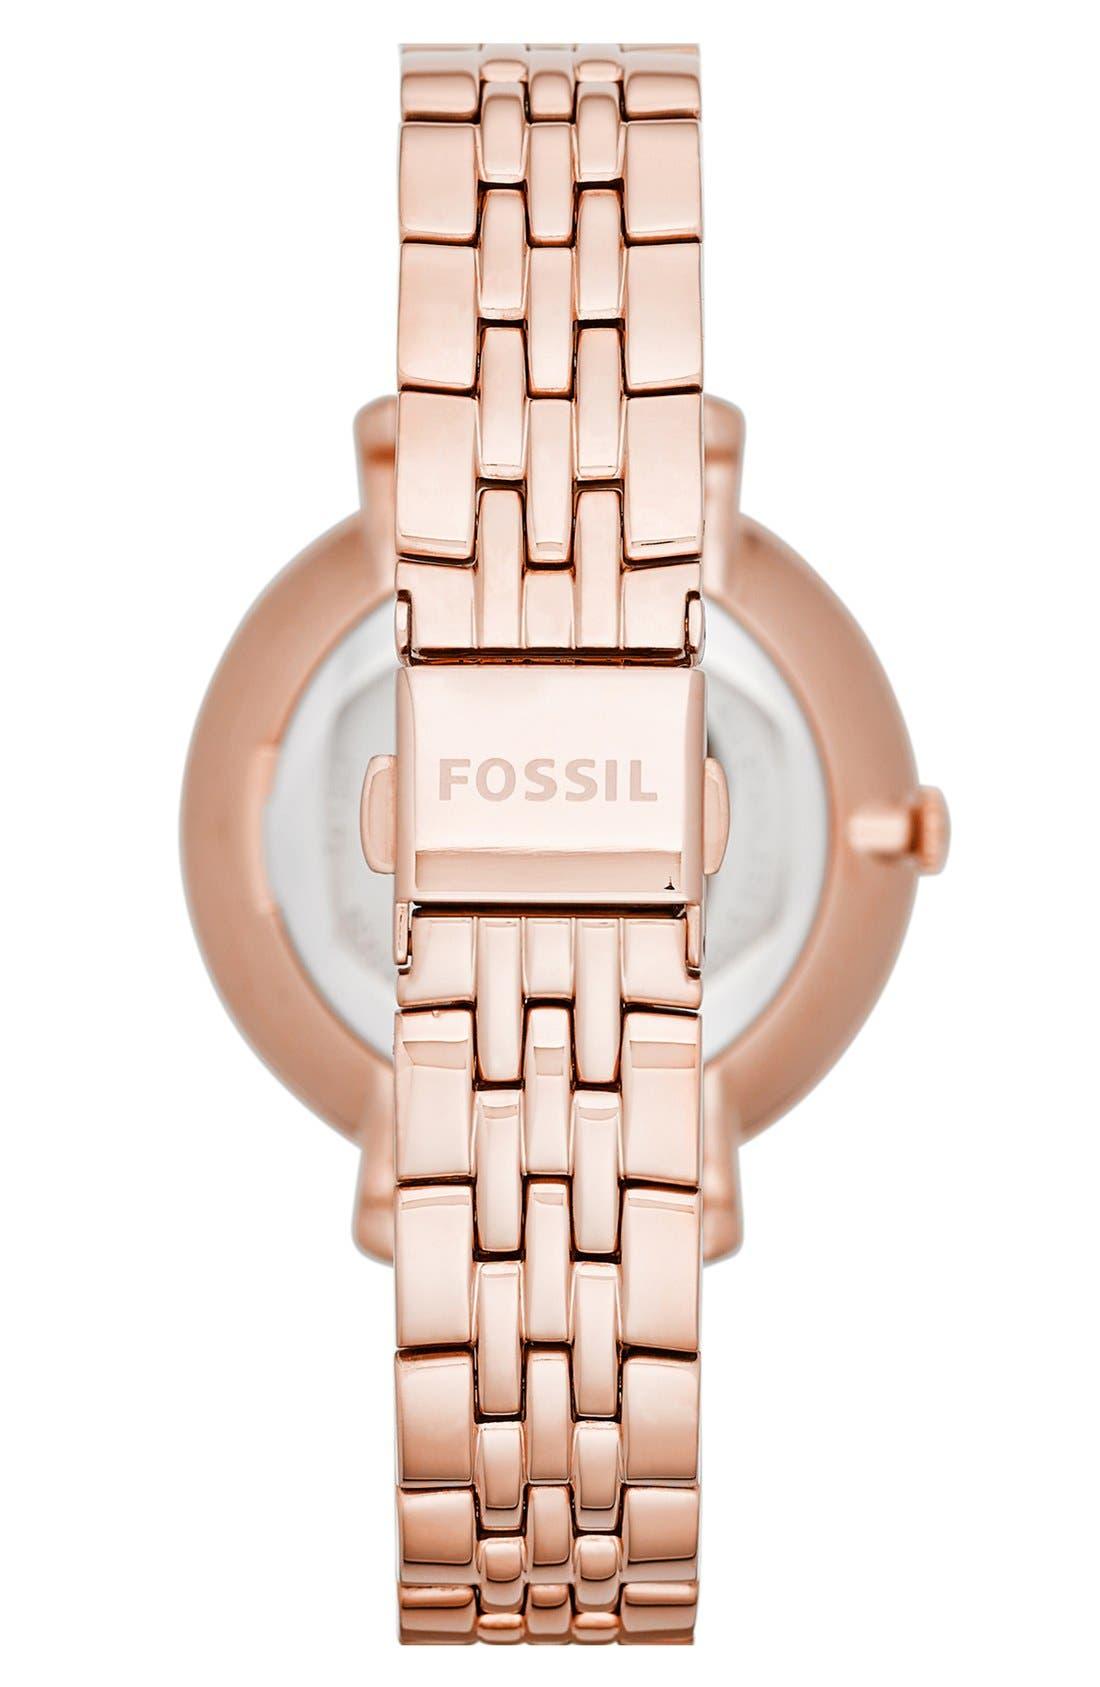 FOSSIL, 'Jacqueline' Round Bracelet Watch, 36mm, Alternate thumbnail 2, color, ROSE GOLD